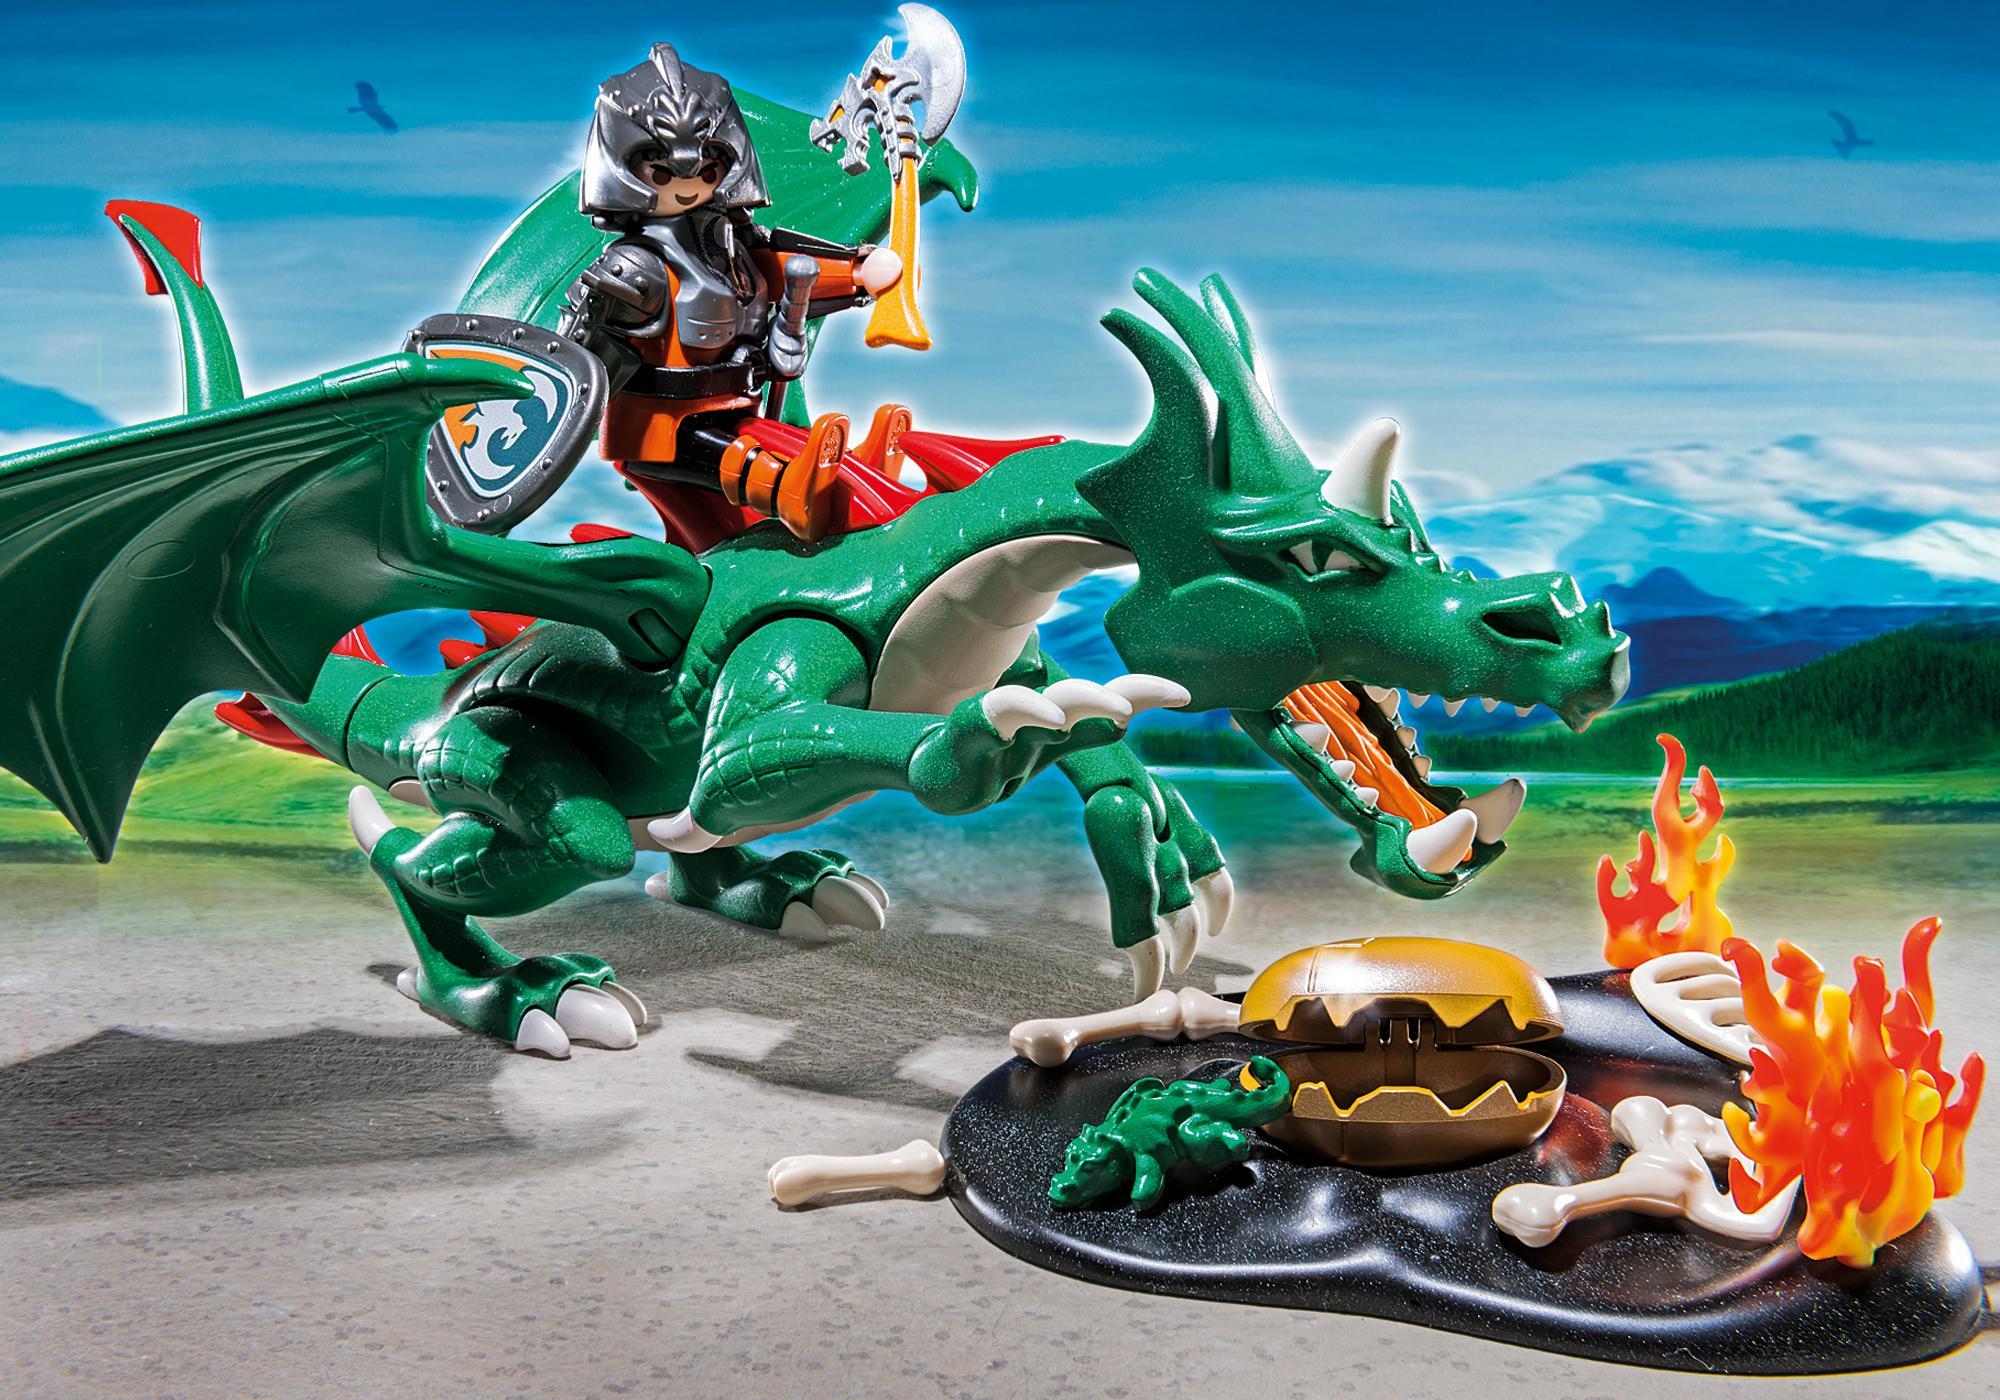 http://media.playmobil.com/i/playmobil/6003_product_extra1/Great Dragon